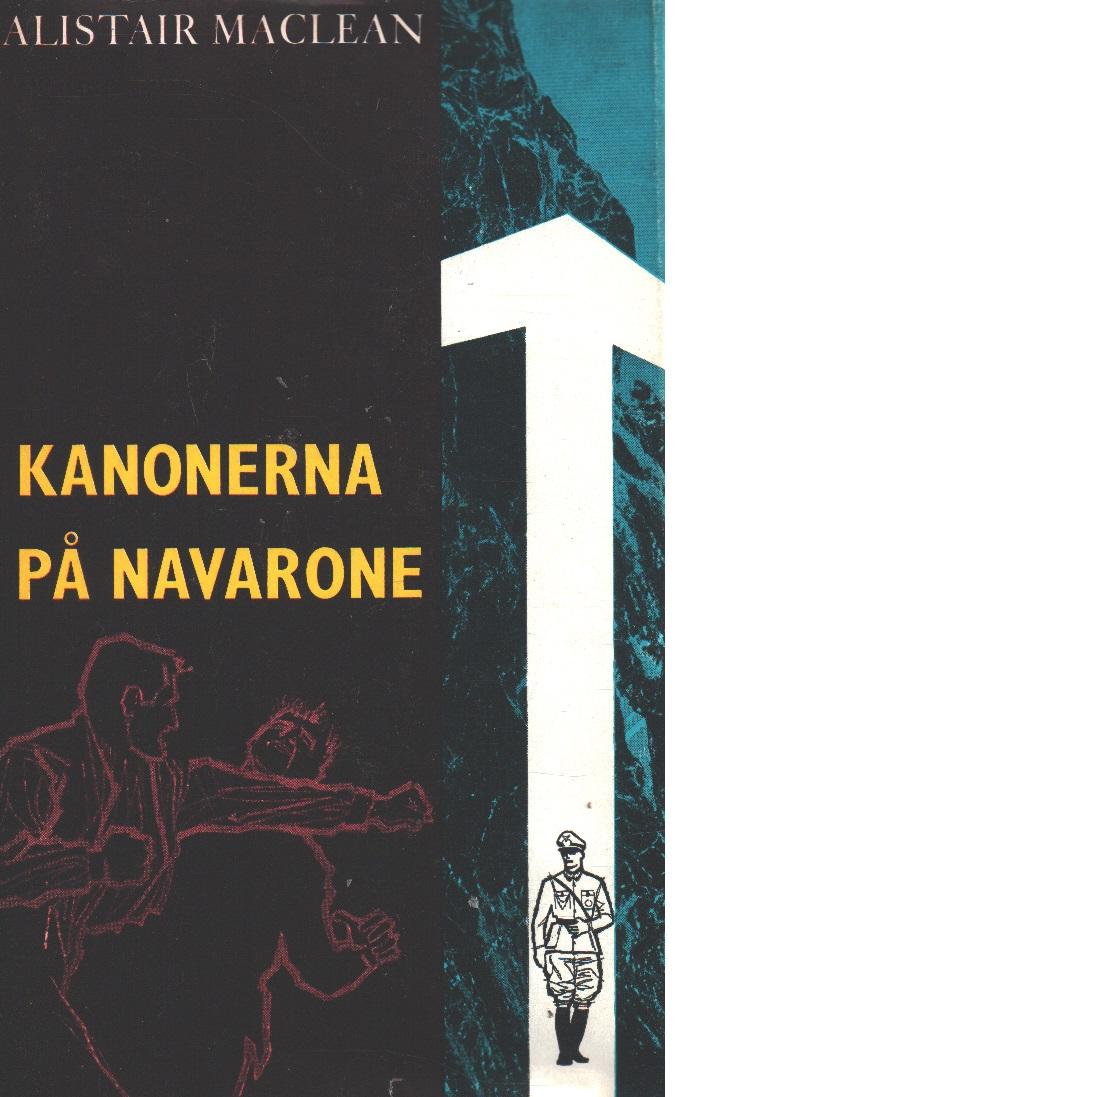 Kanonerna på Navarone - Maclean, Alistair